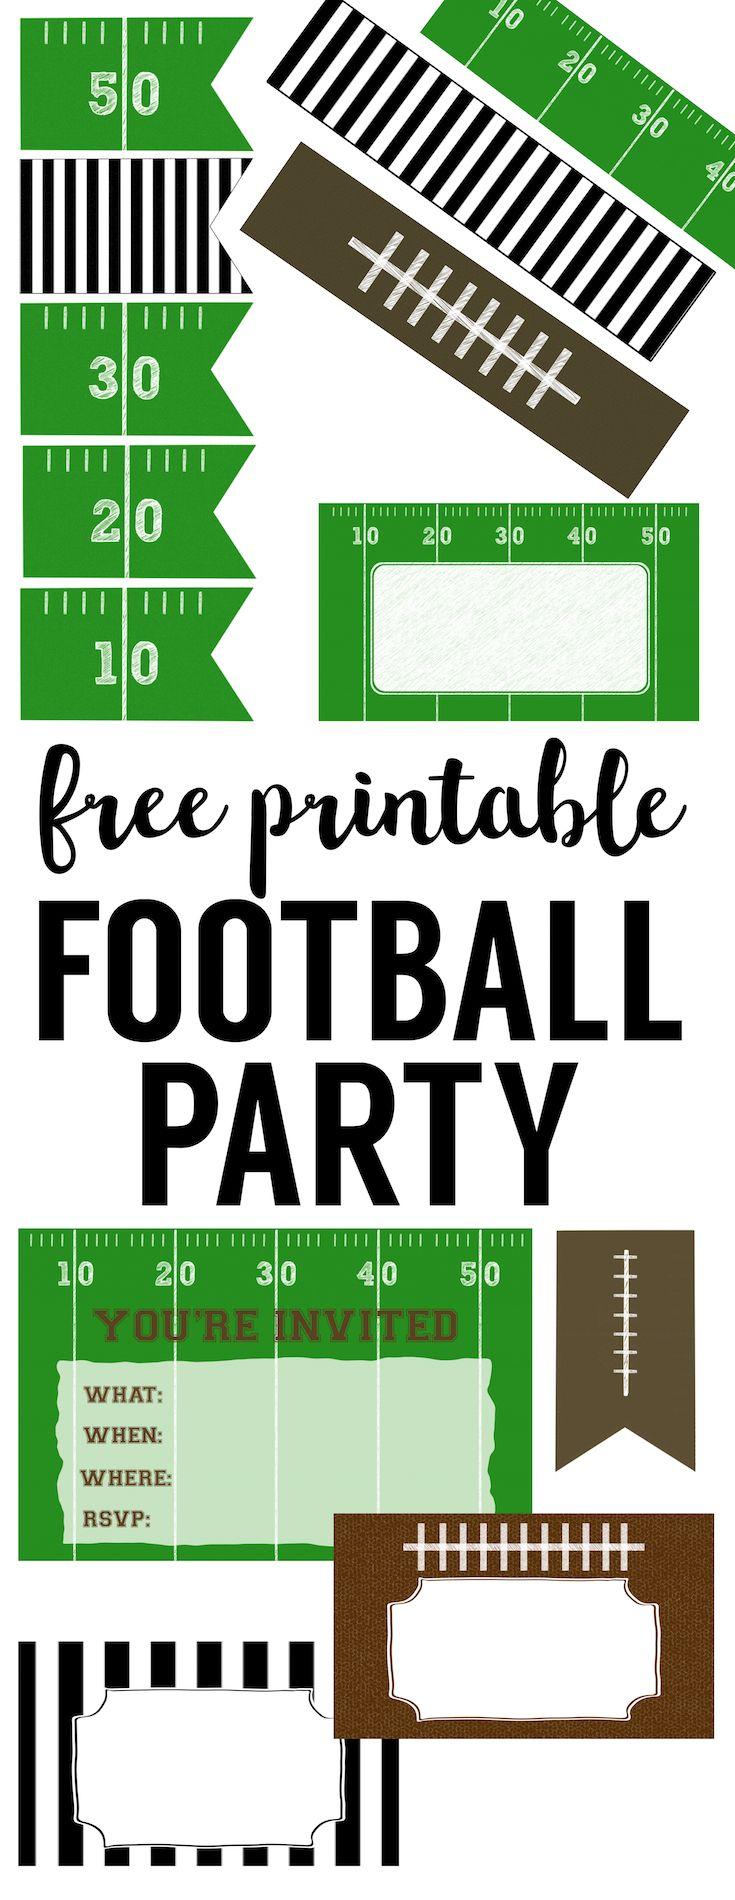 Super Bowl Party Decorations Uk Best 25 Football Party Decorations Ideas On Pinterest  Super